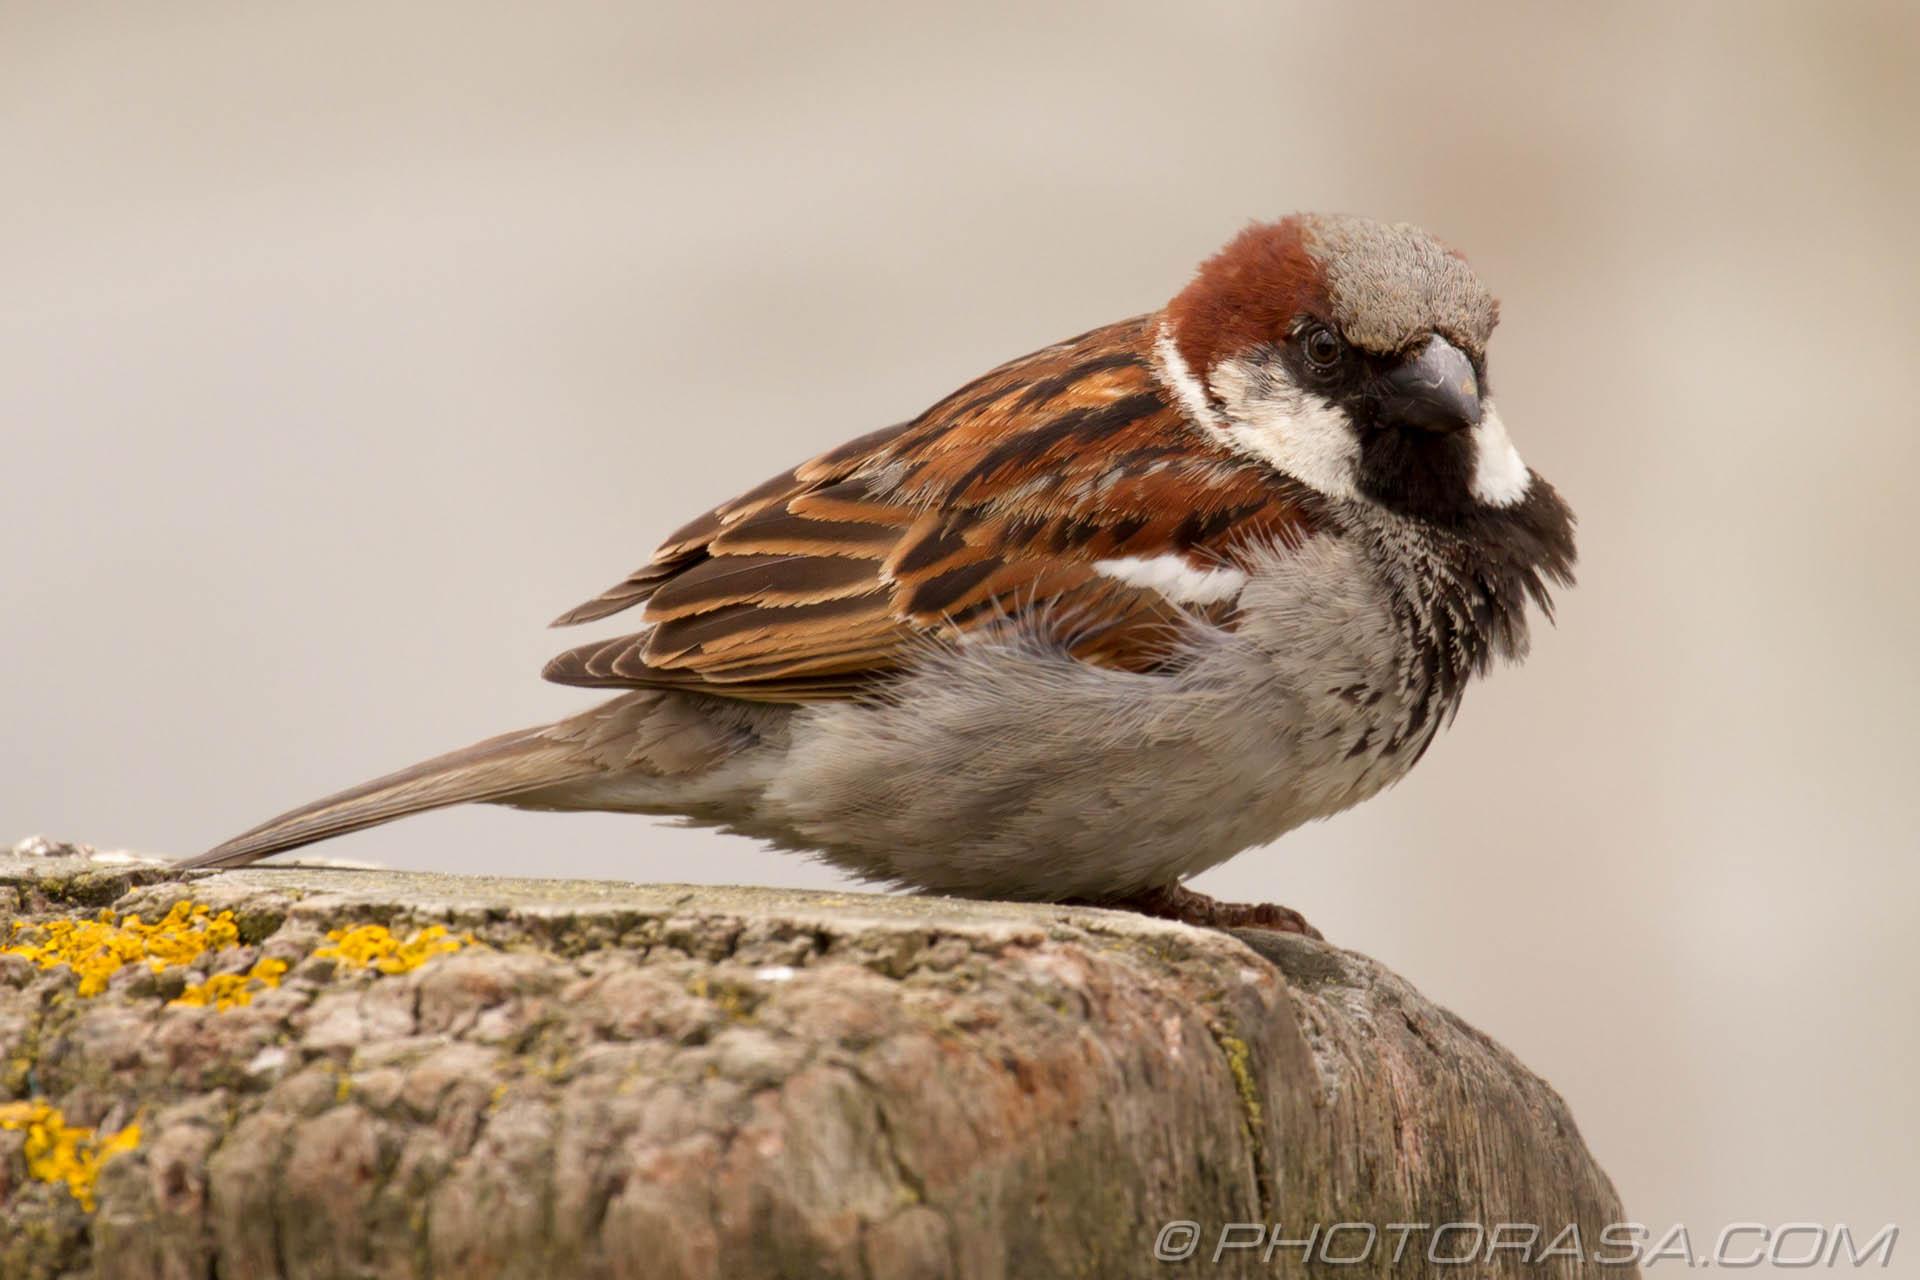 http://photorasa.com/sparrows/sea-sparrow/